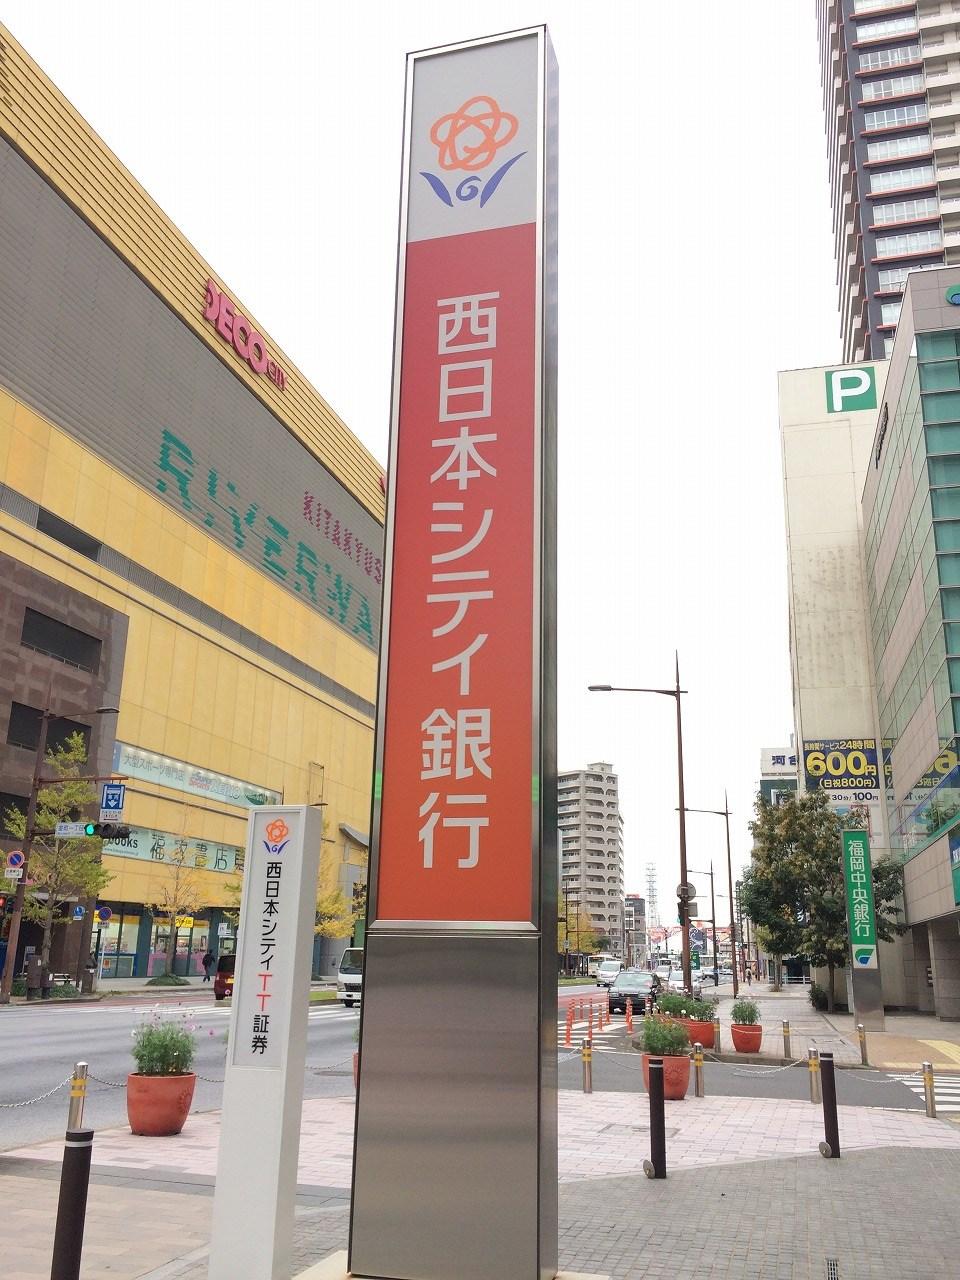 銀行:西日本シティ銀行 JR朽網駅 1776m